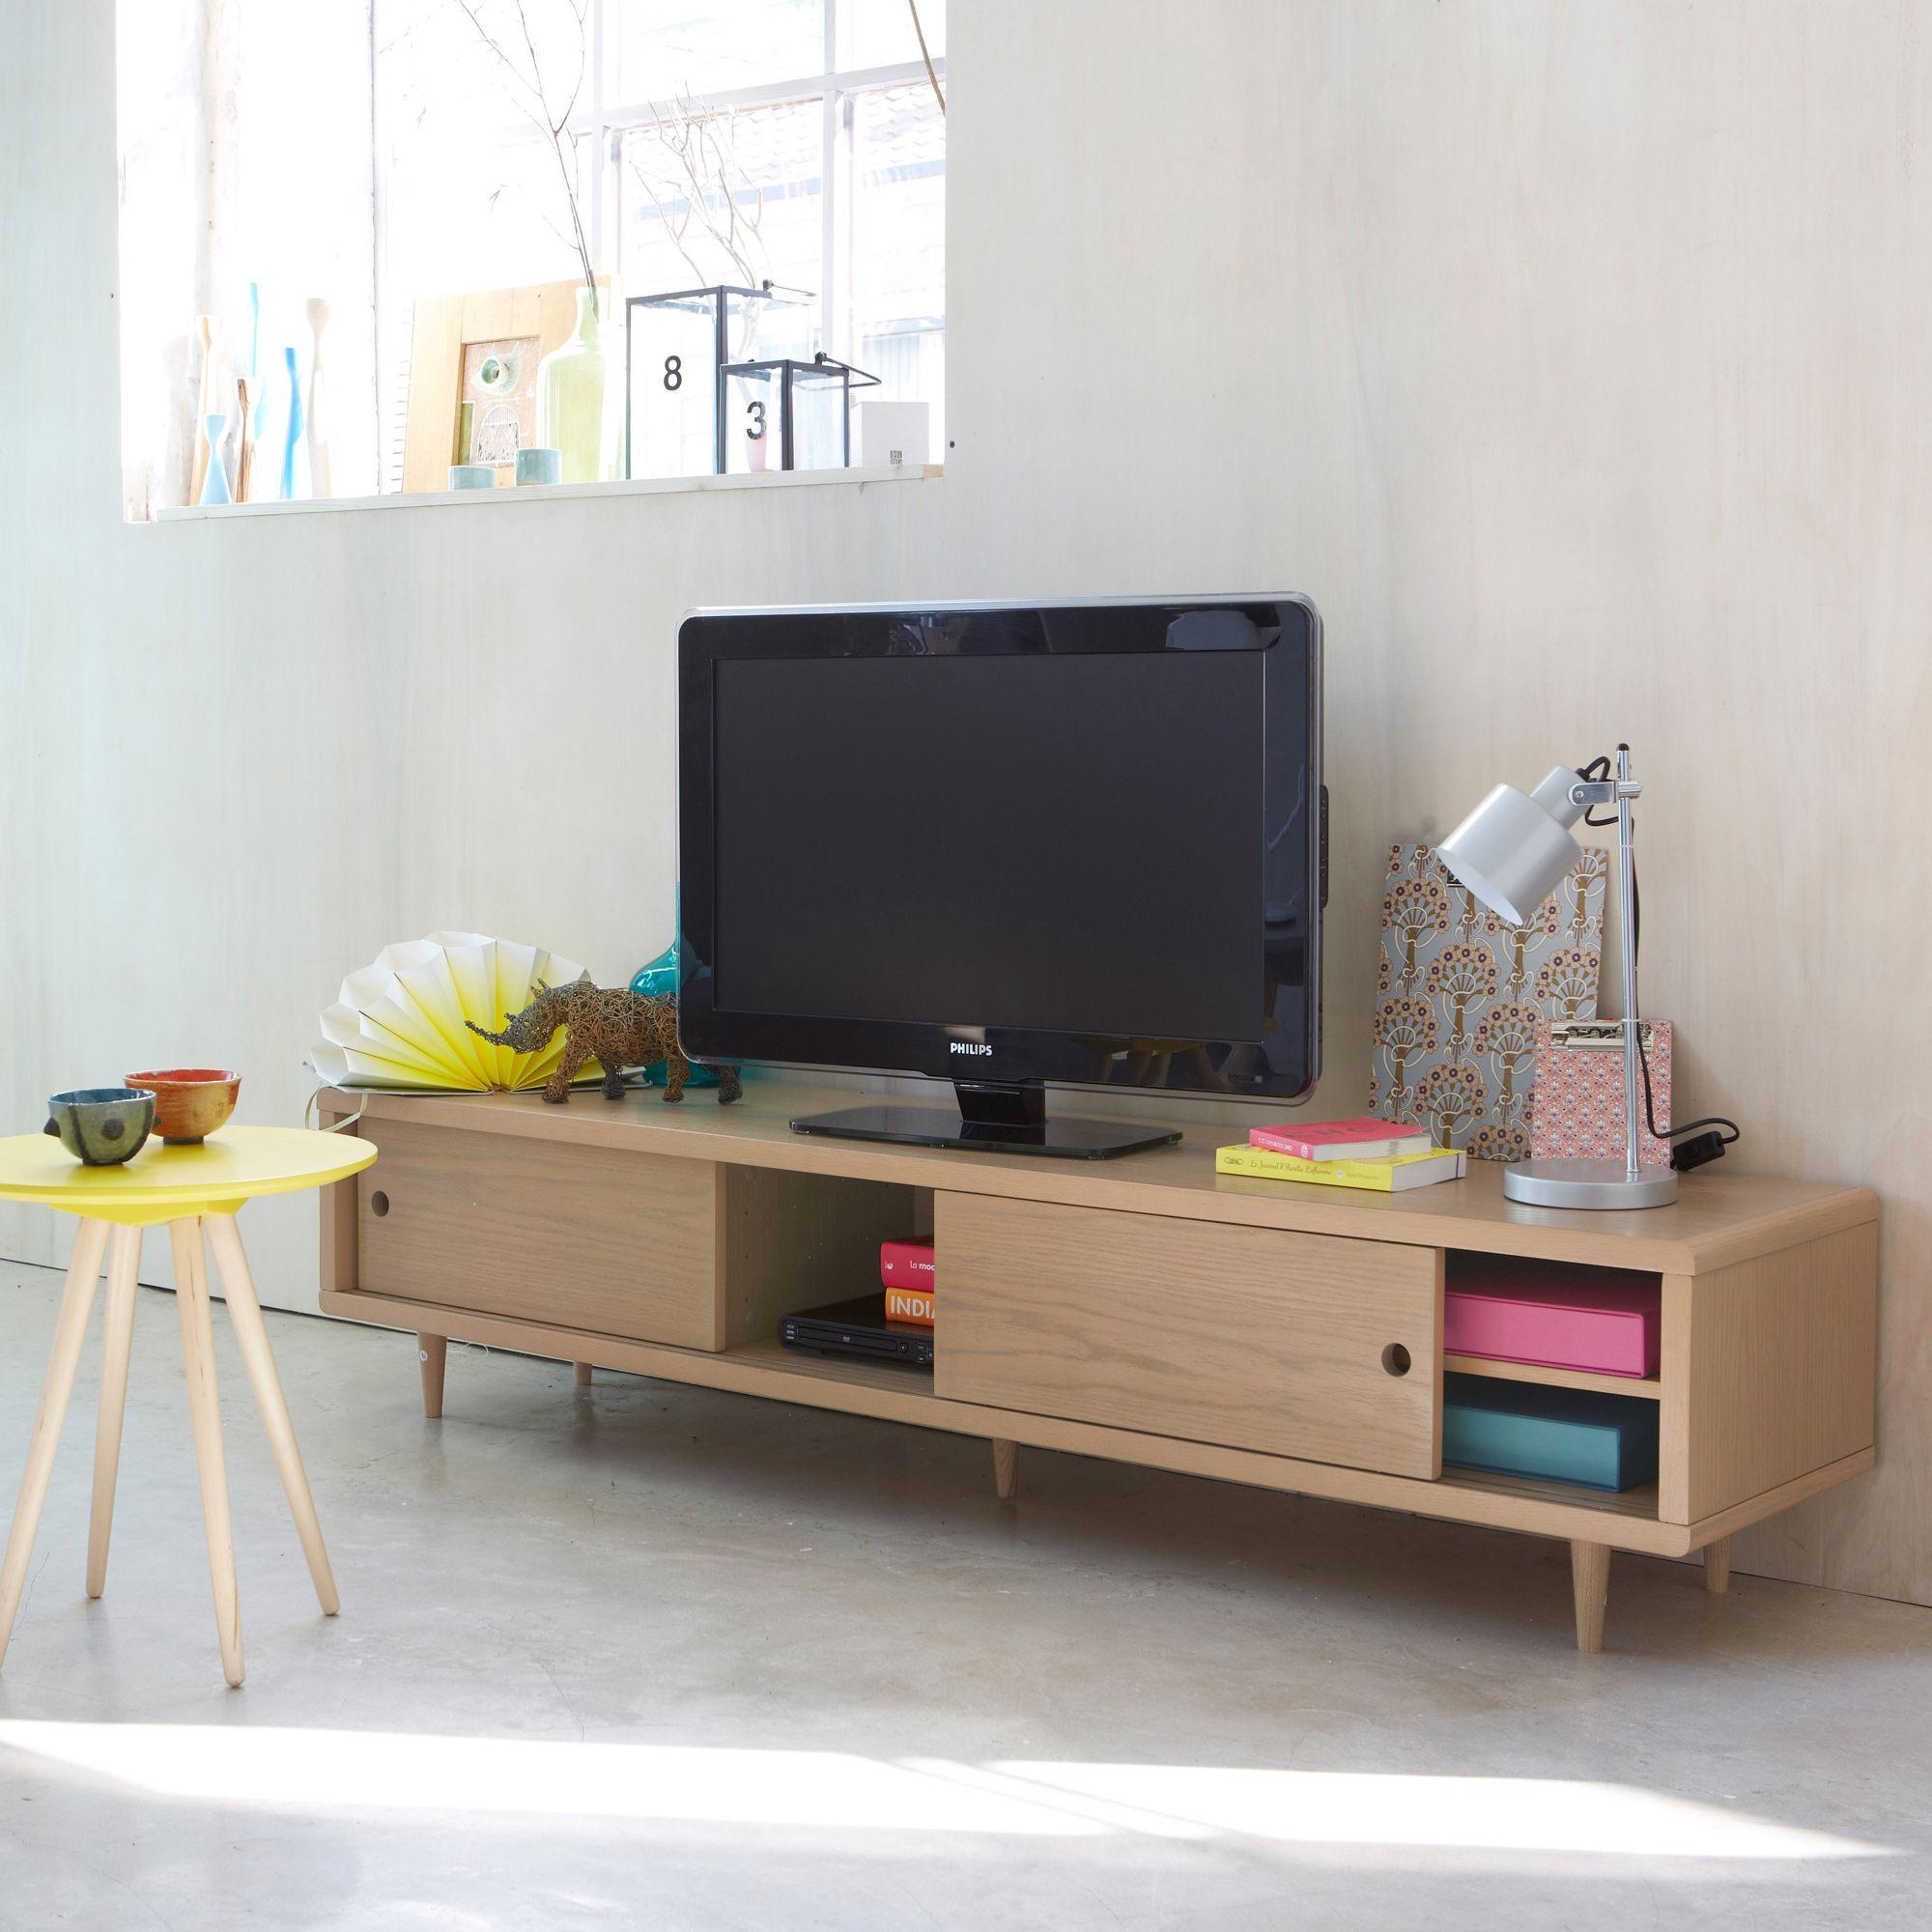 Banc TV plaqué chêne NEW RETRO - 3 Suisses | meuble ouaga ...